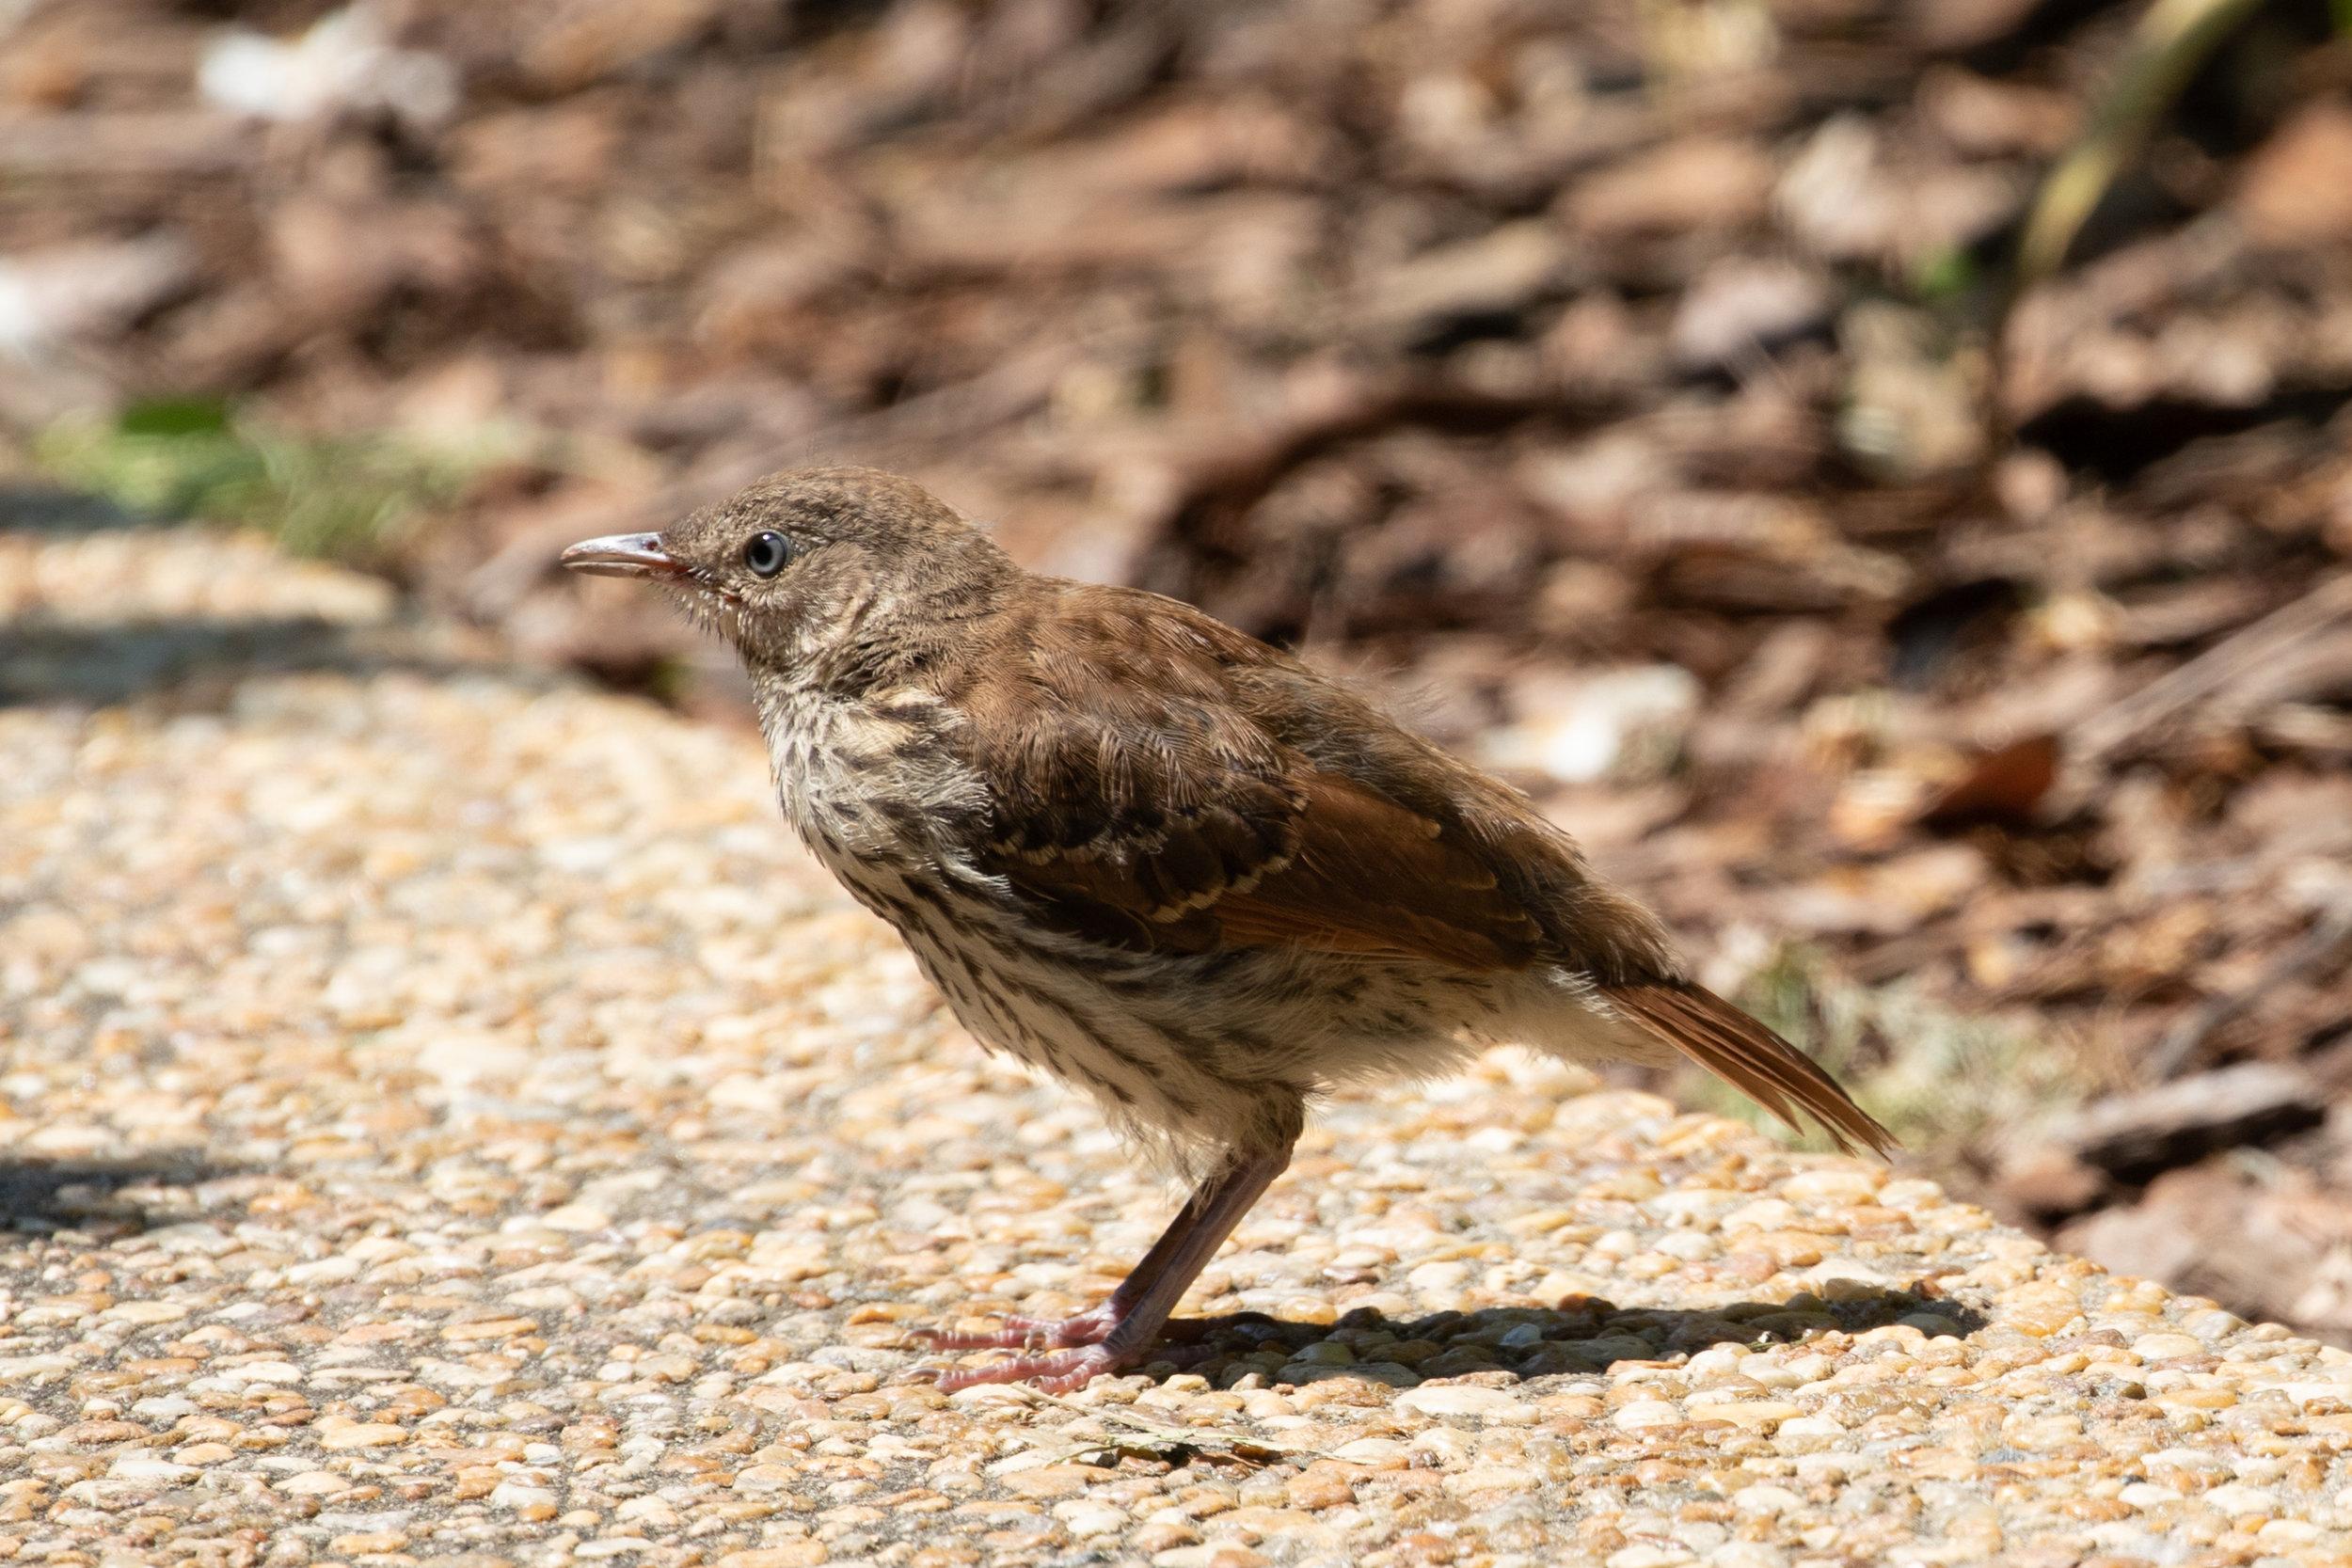 Brown Thrasher, juvenile